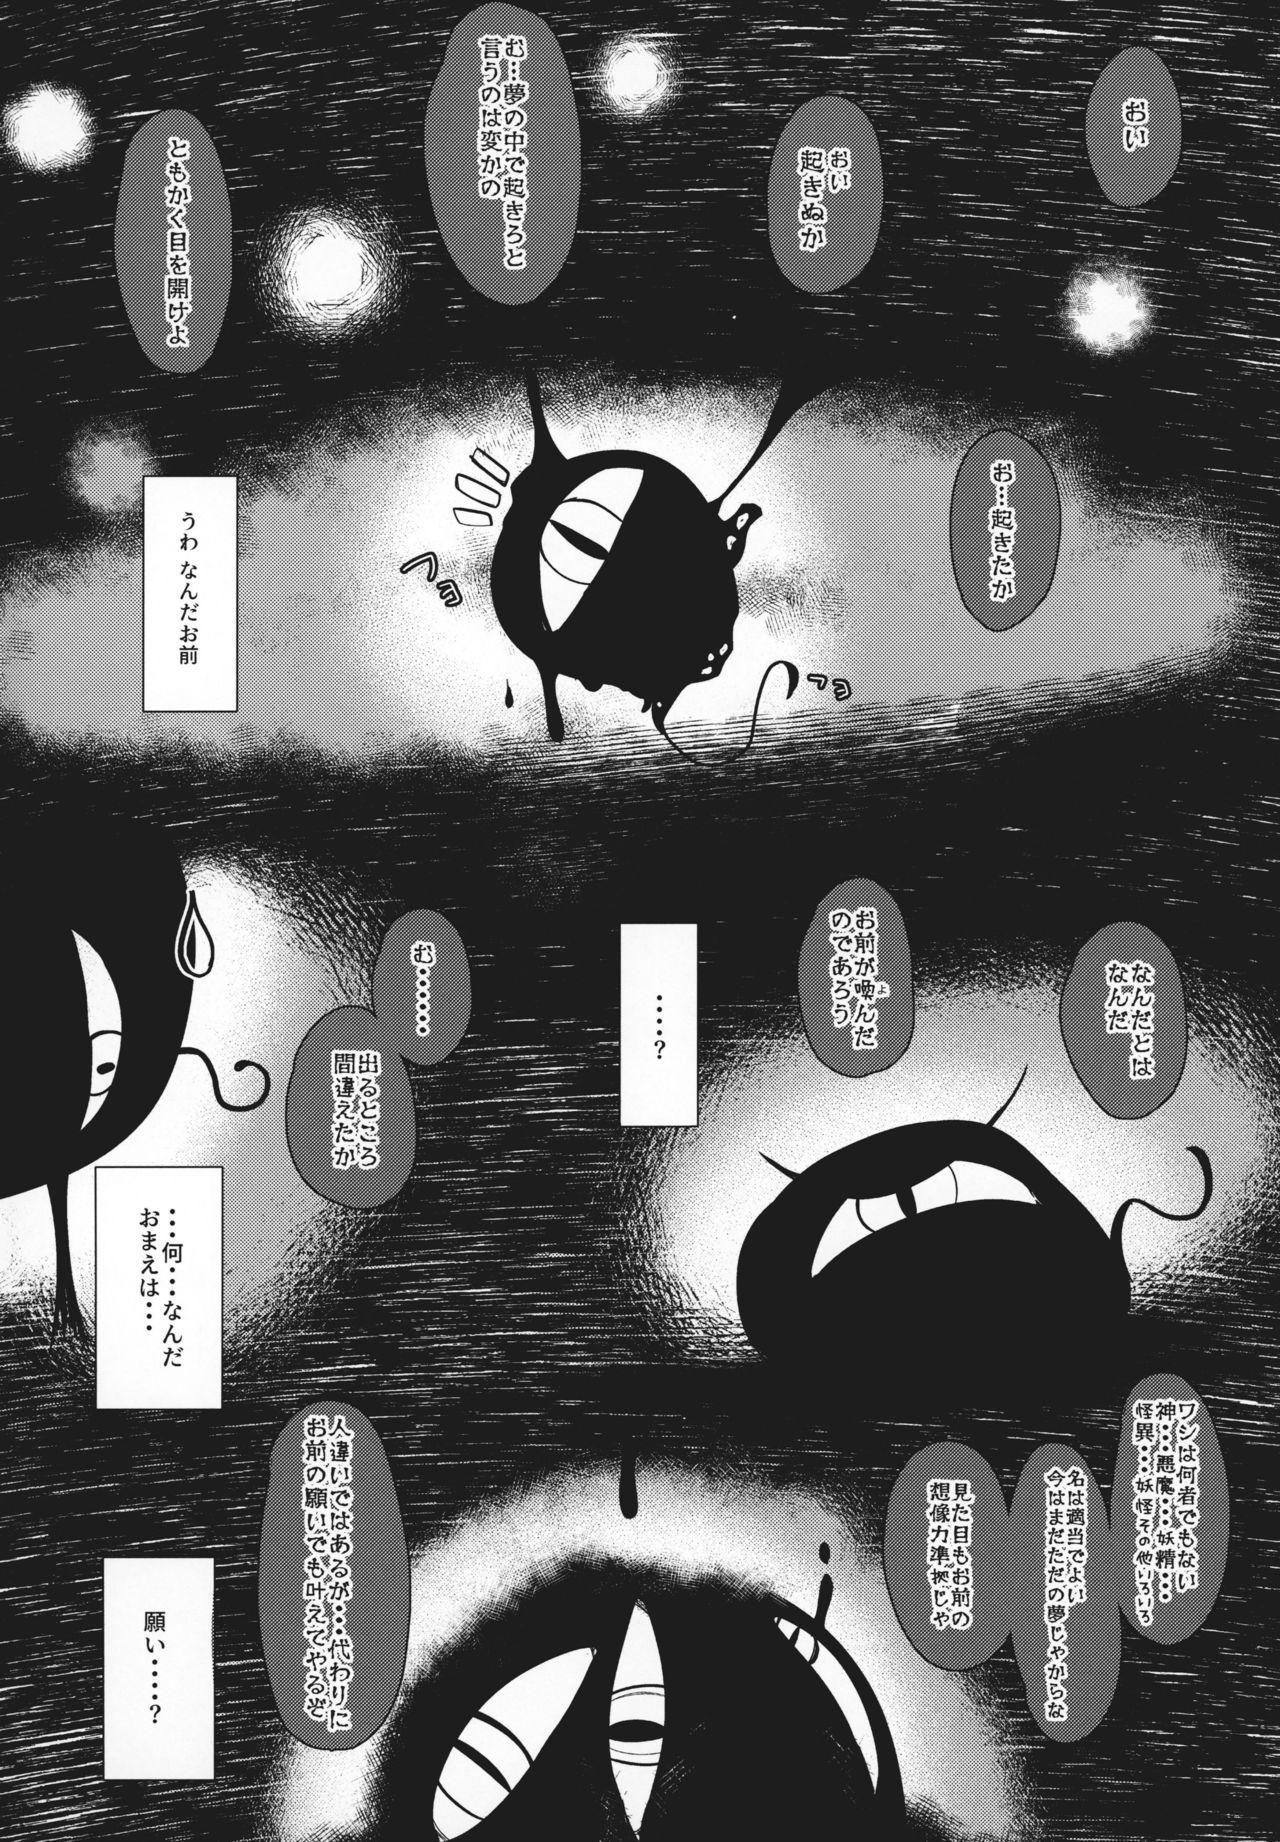 (COMITIA127) [Manpuchi (Nekodel)] Uro -Makuai- Kanwa 2